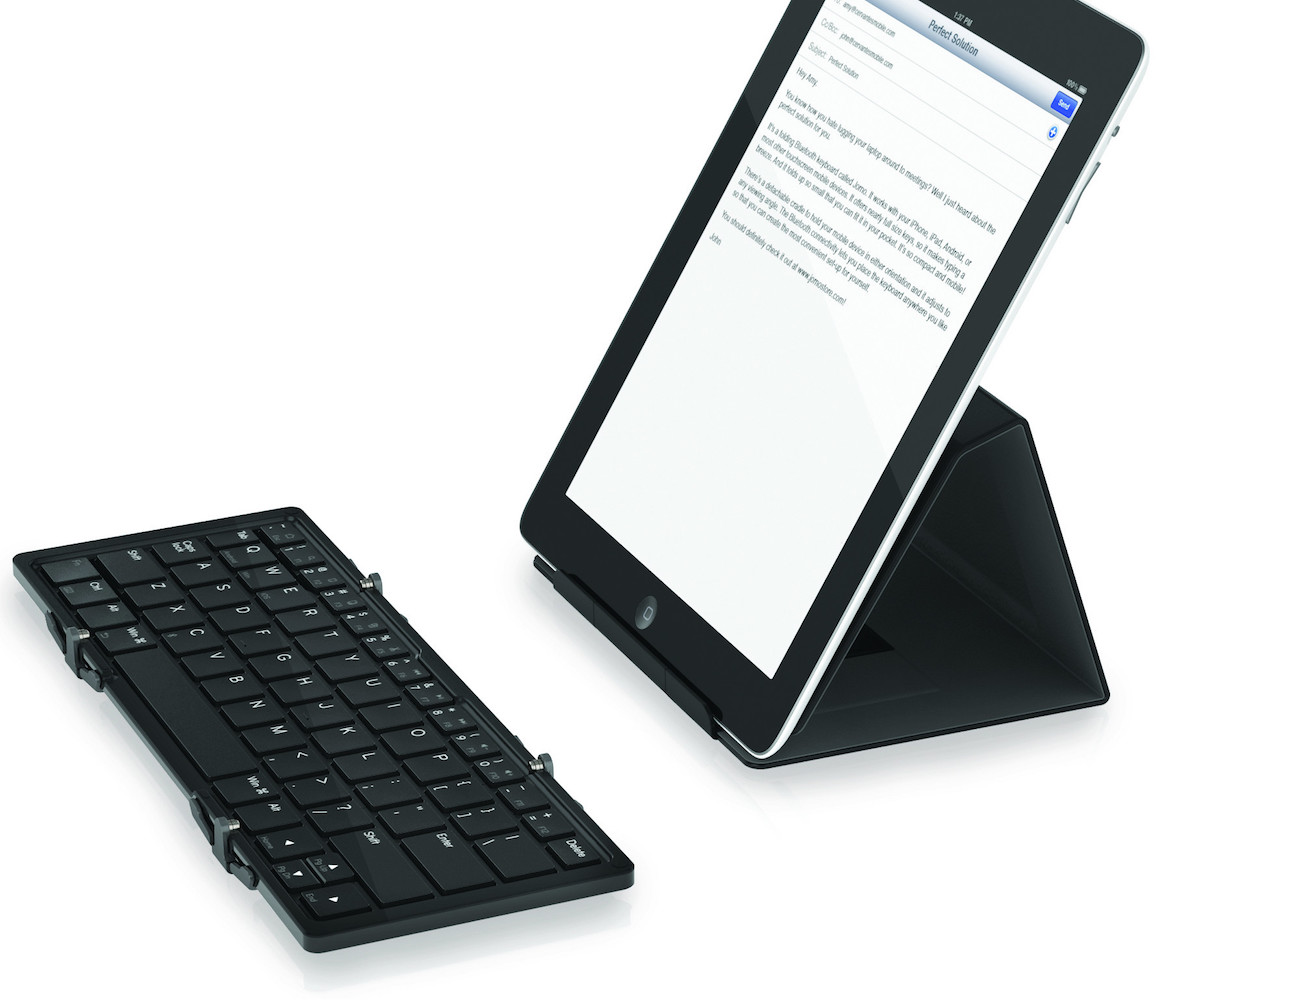 jorno-ultra-slim-mobile-keyboard-09